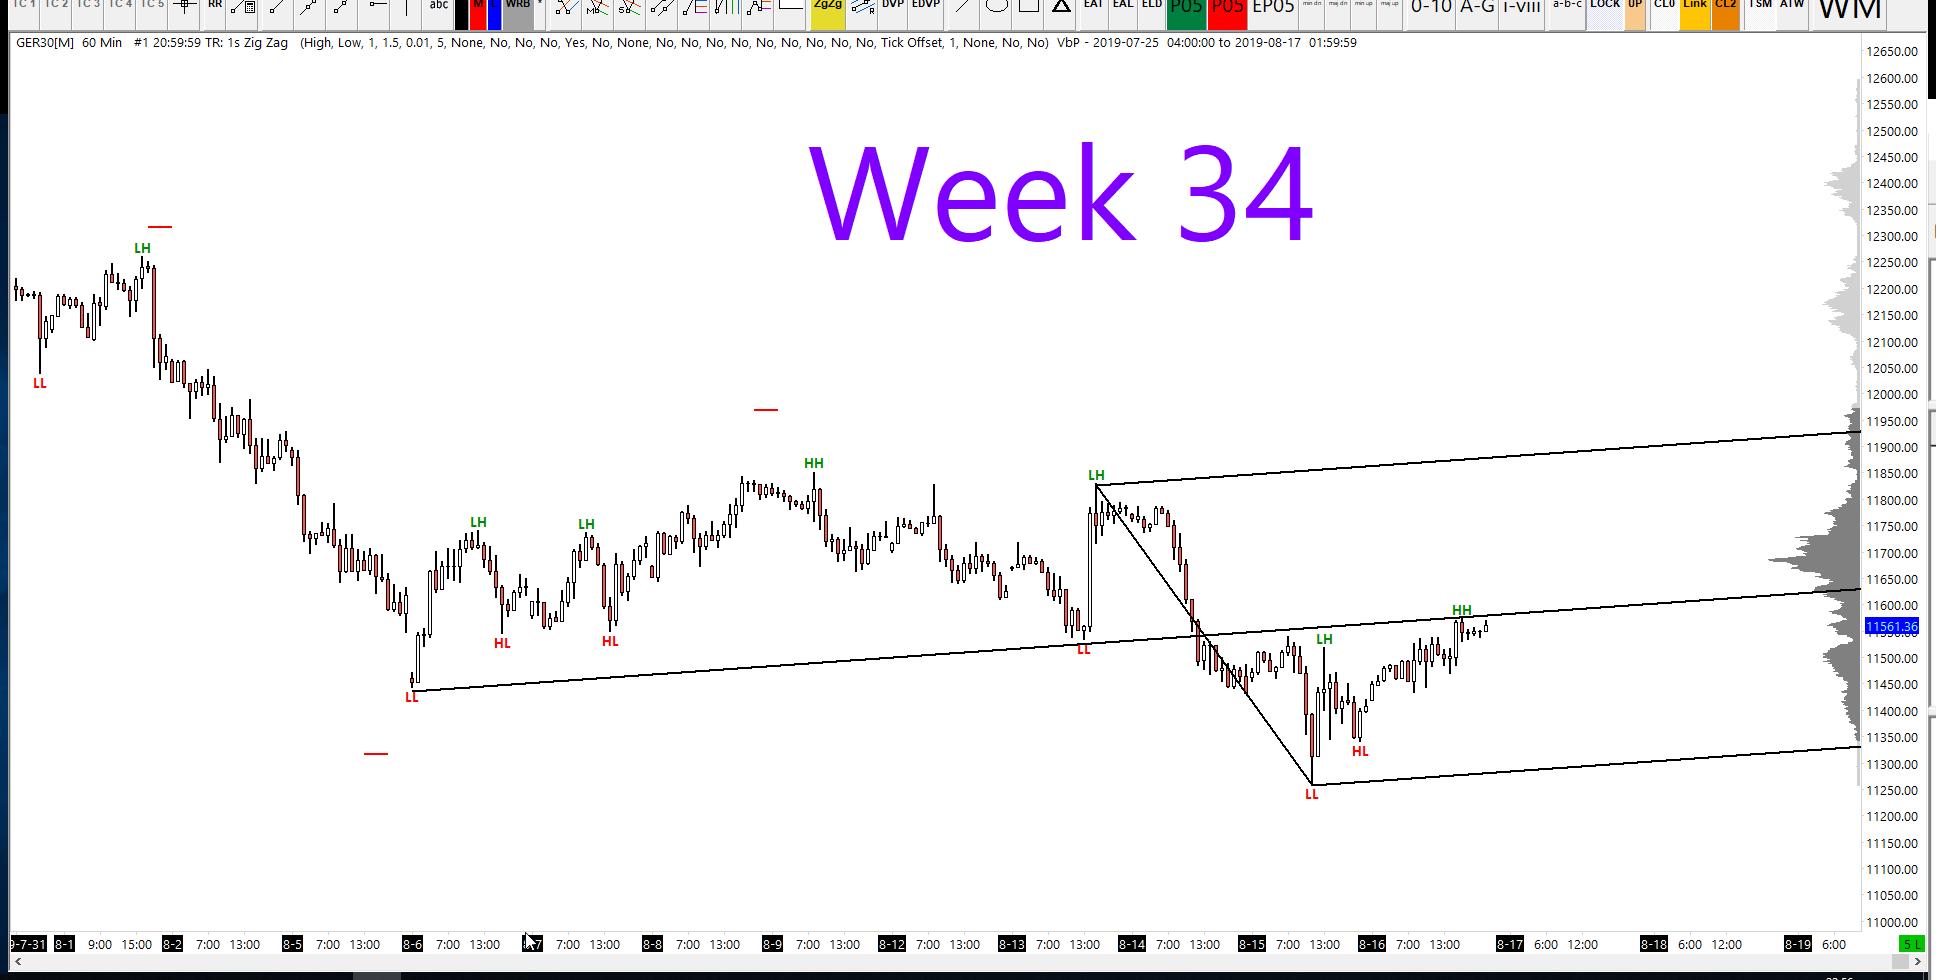 Dax Technical Analysis: Week 34